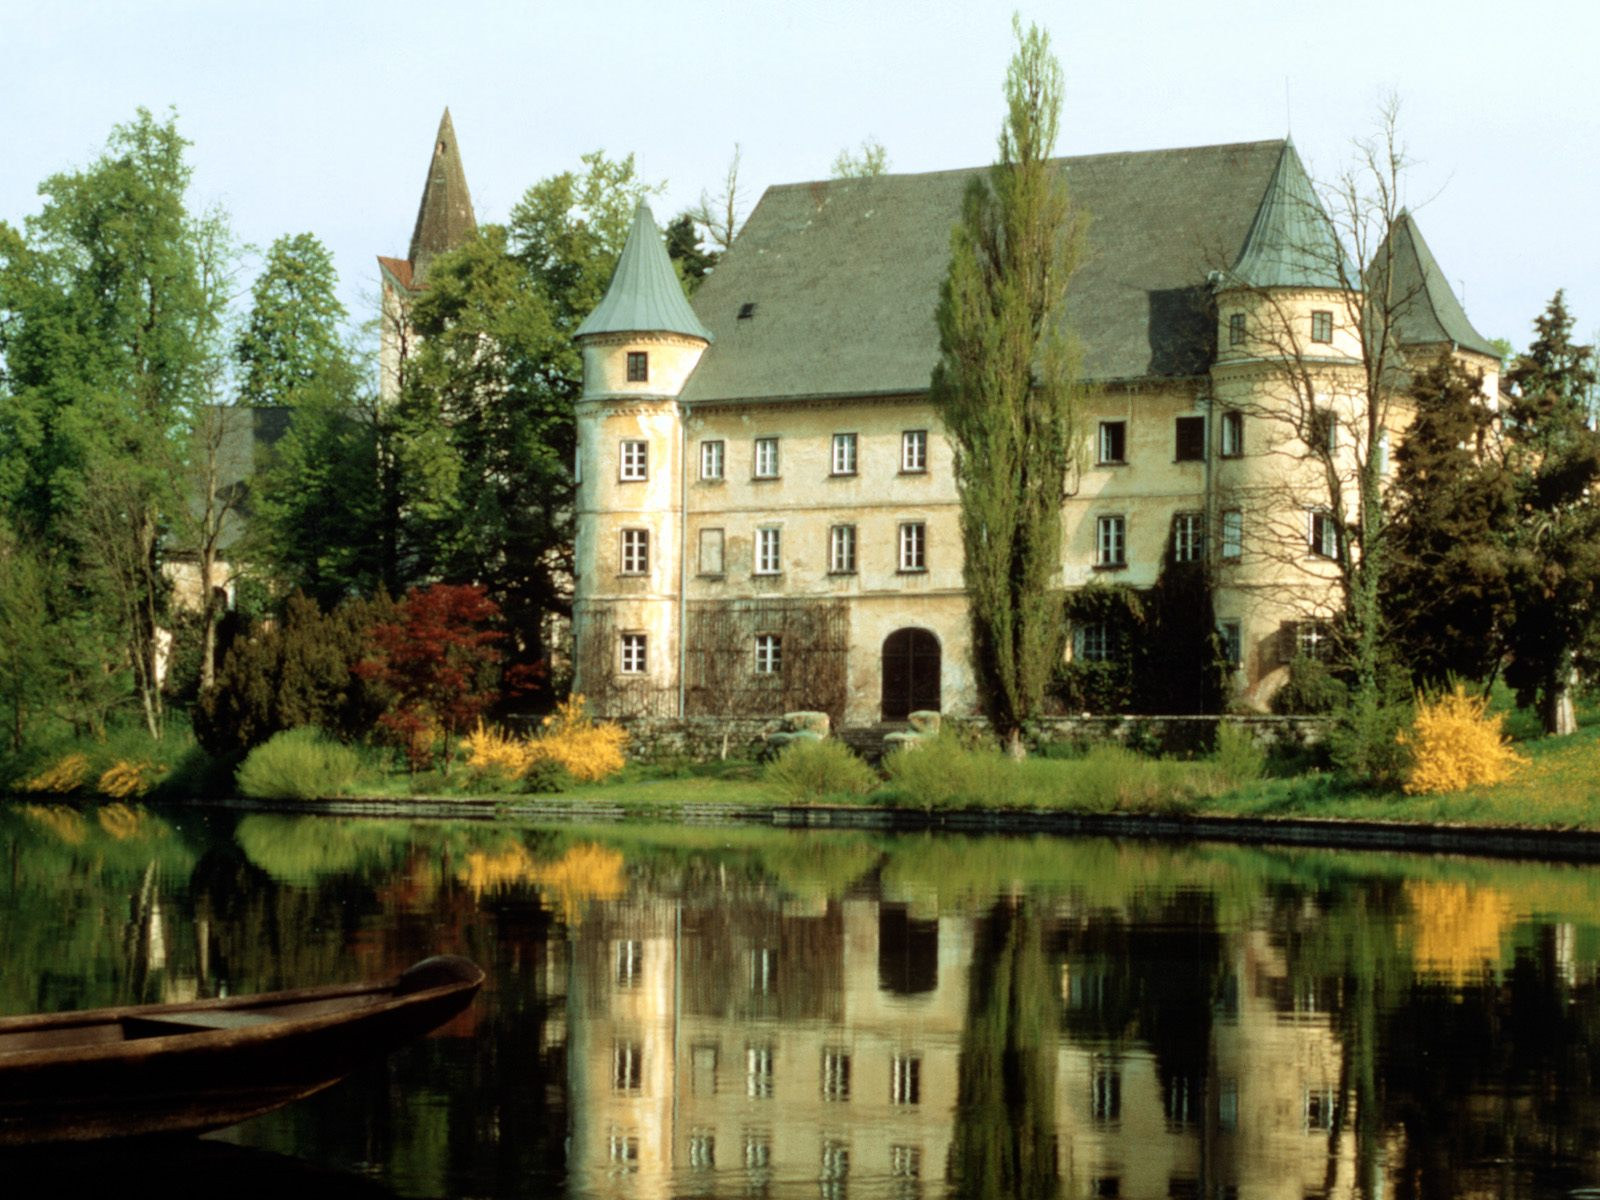 http://3.bp.blogspot.com/_mmBw3uzPnJI/TO6n4yD3-OI/AAAAAAABxfI/Eb49j108IxI/s1600/Hagenau-Castle-Austria.jpg